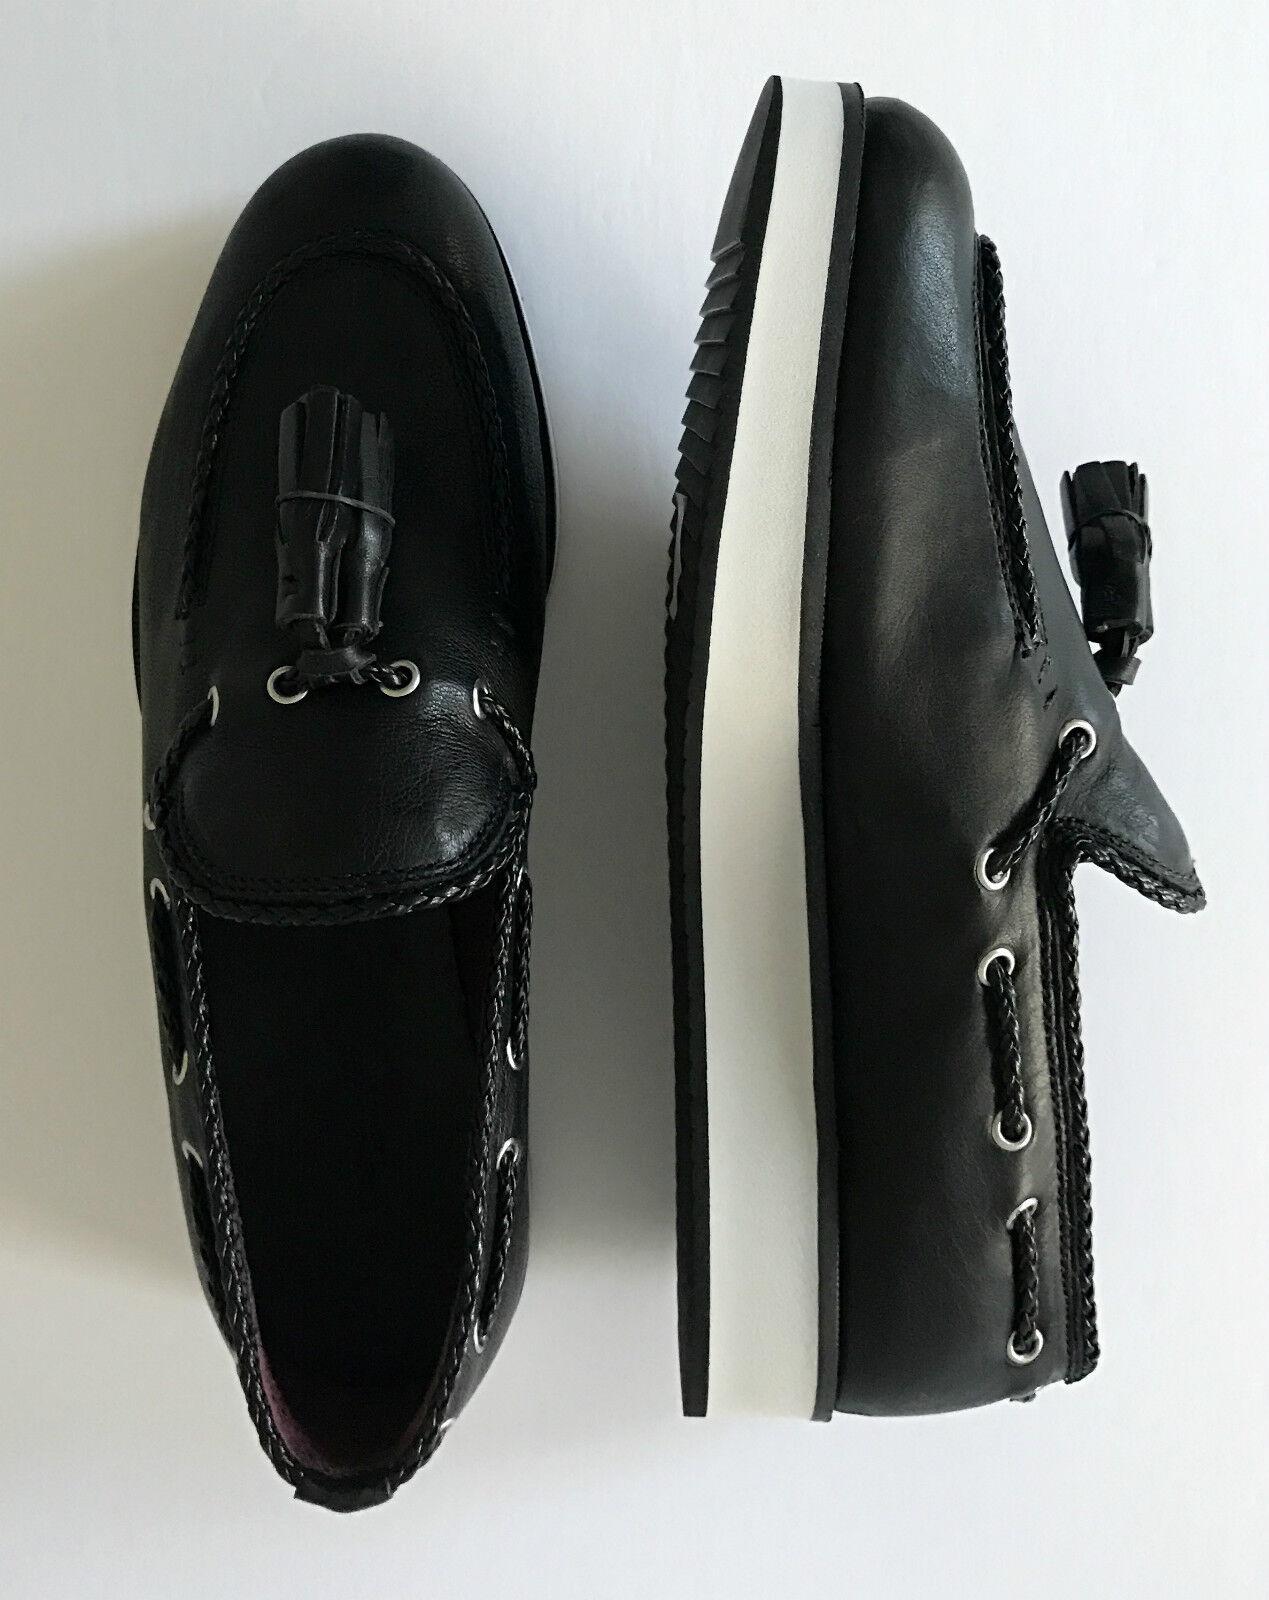 Rag & Bone MCKENZIE Platform Platform Platform Loafer Flat Black 38 38.5 40 NIB  395 ffdcd7